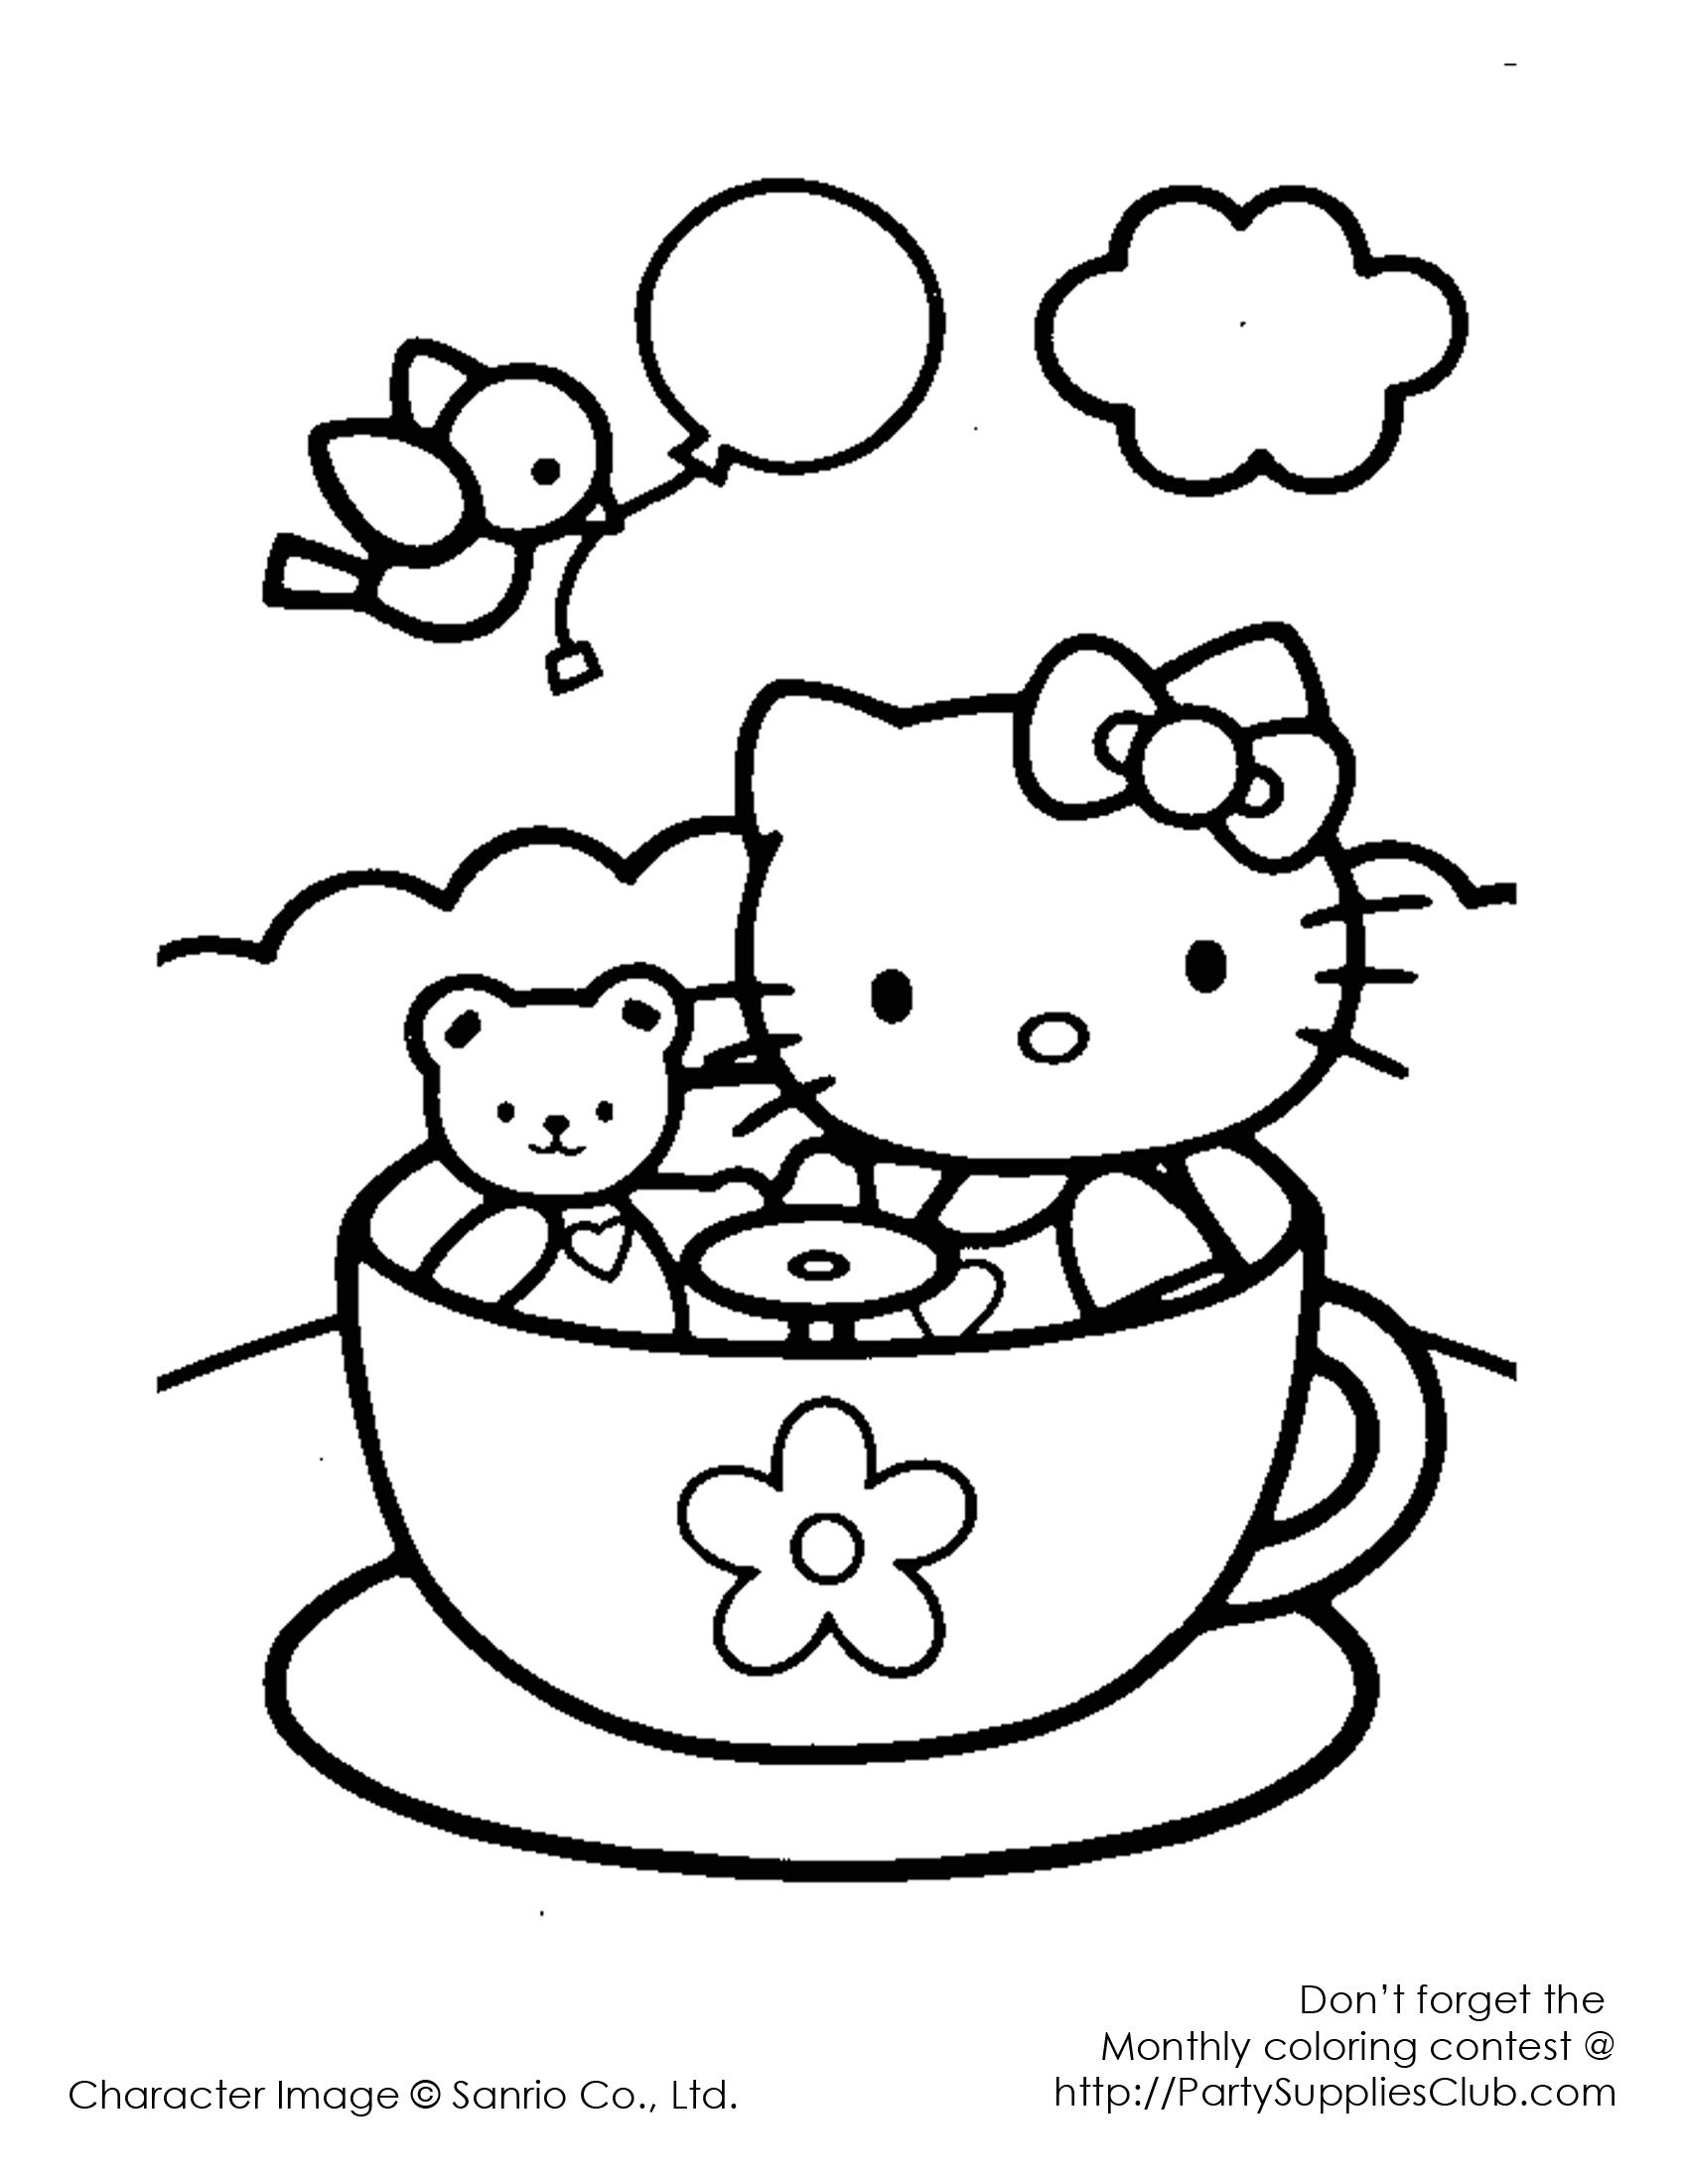 Dibujo para colorear de Hello Kitty en las tazas de la feria